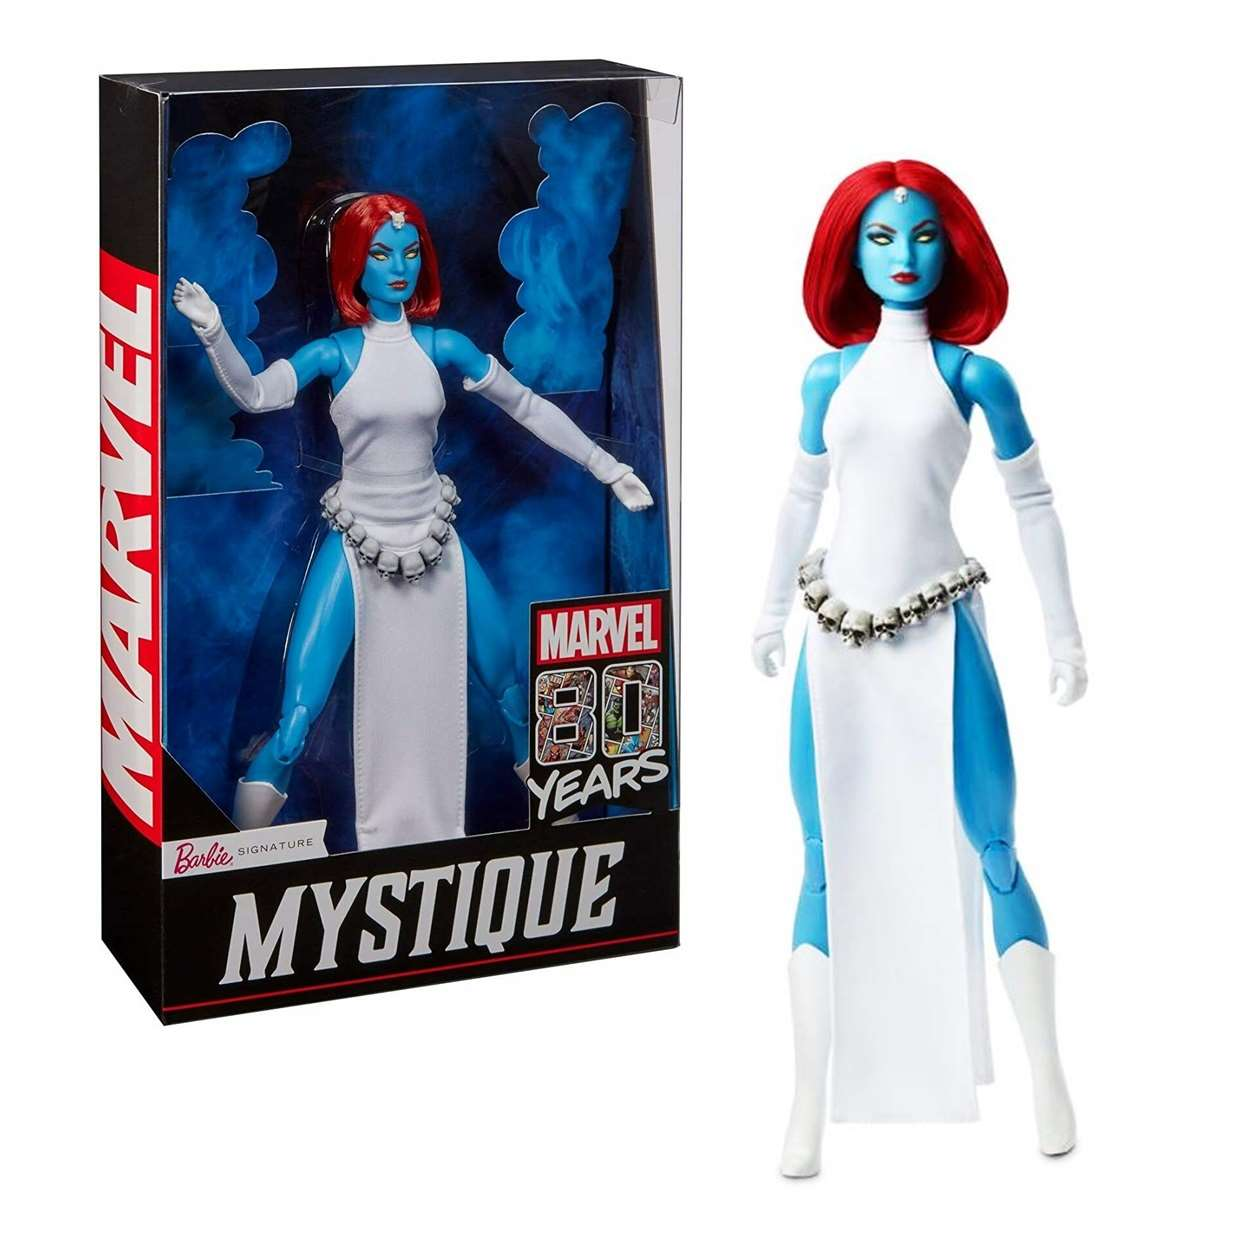 Mystique Doll Figura Barbie Signature Marvel 80th Years